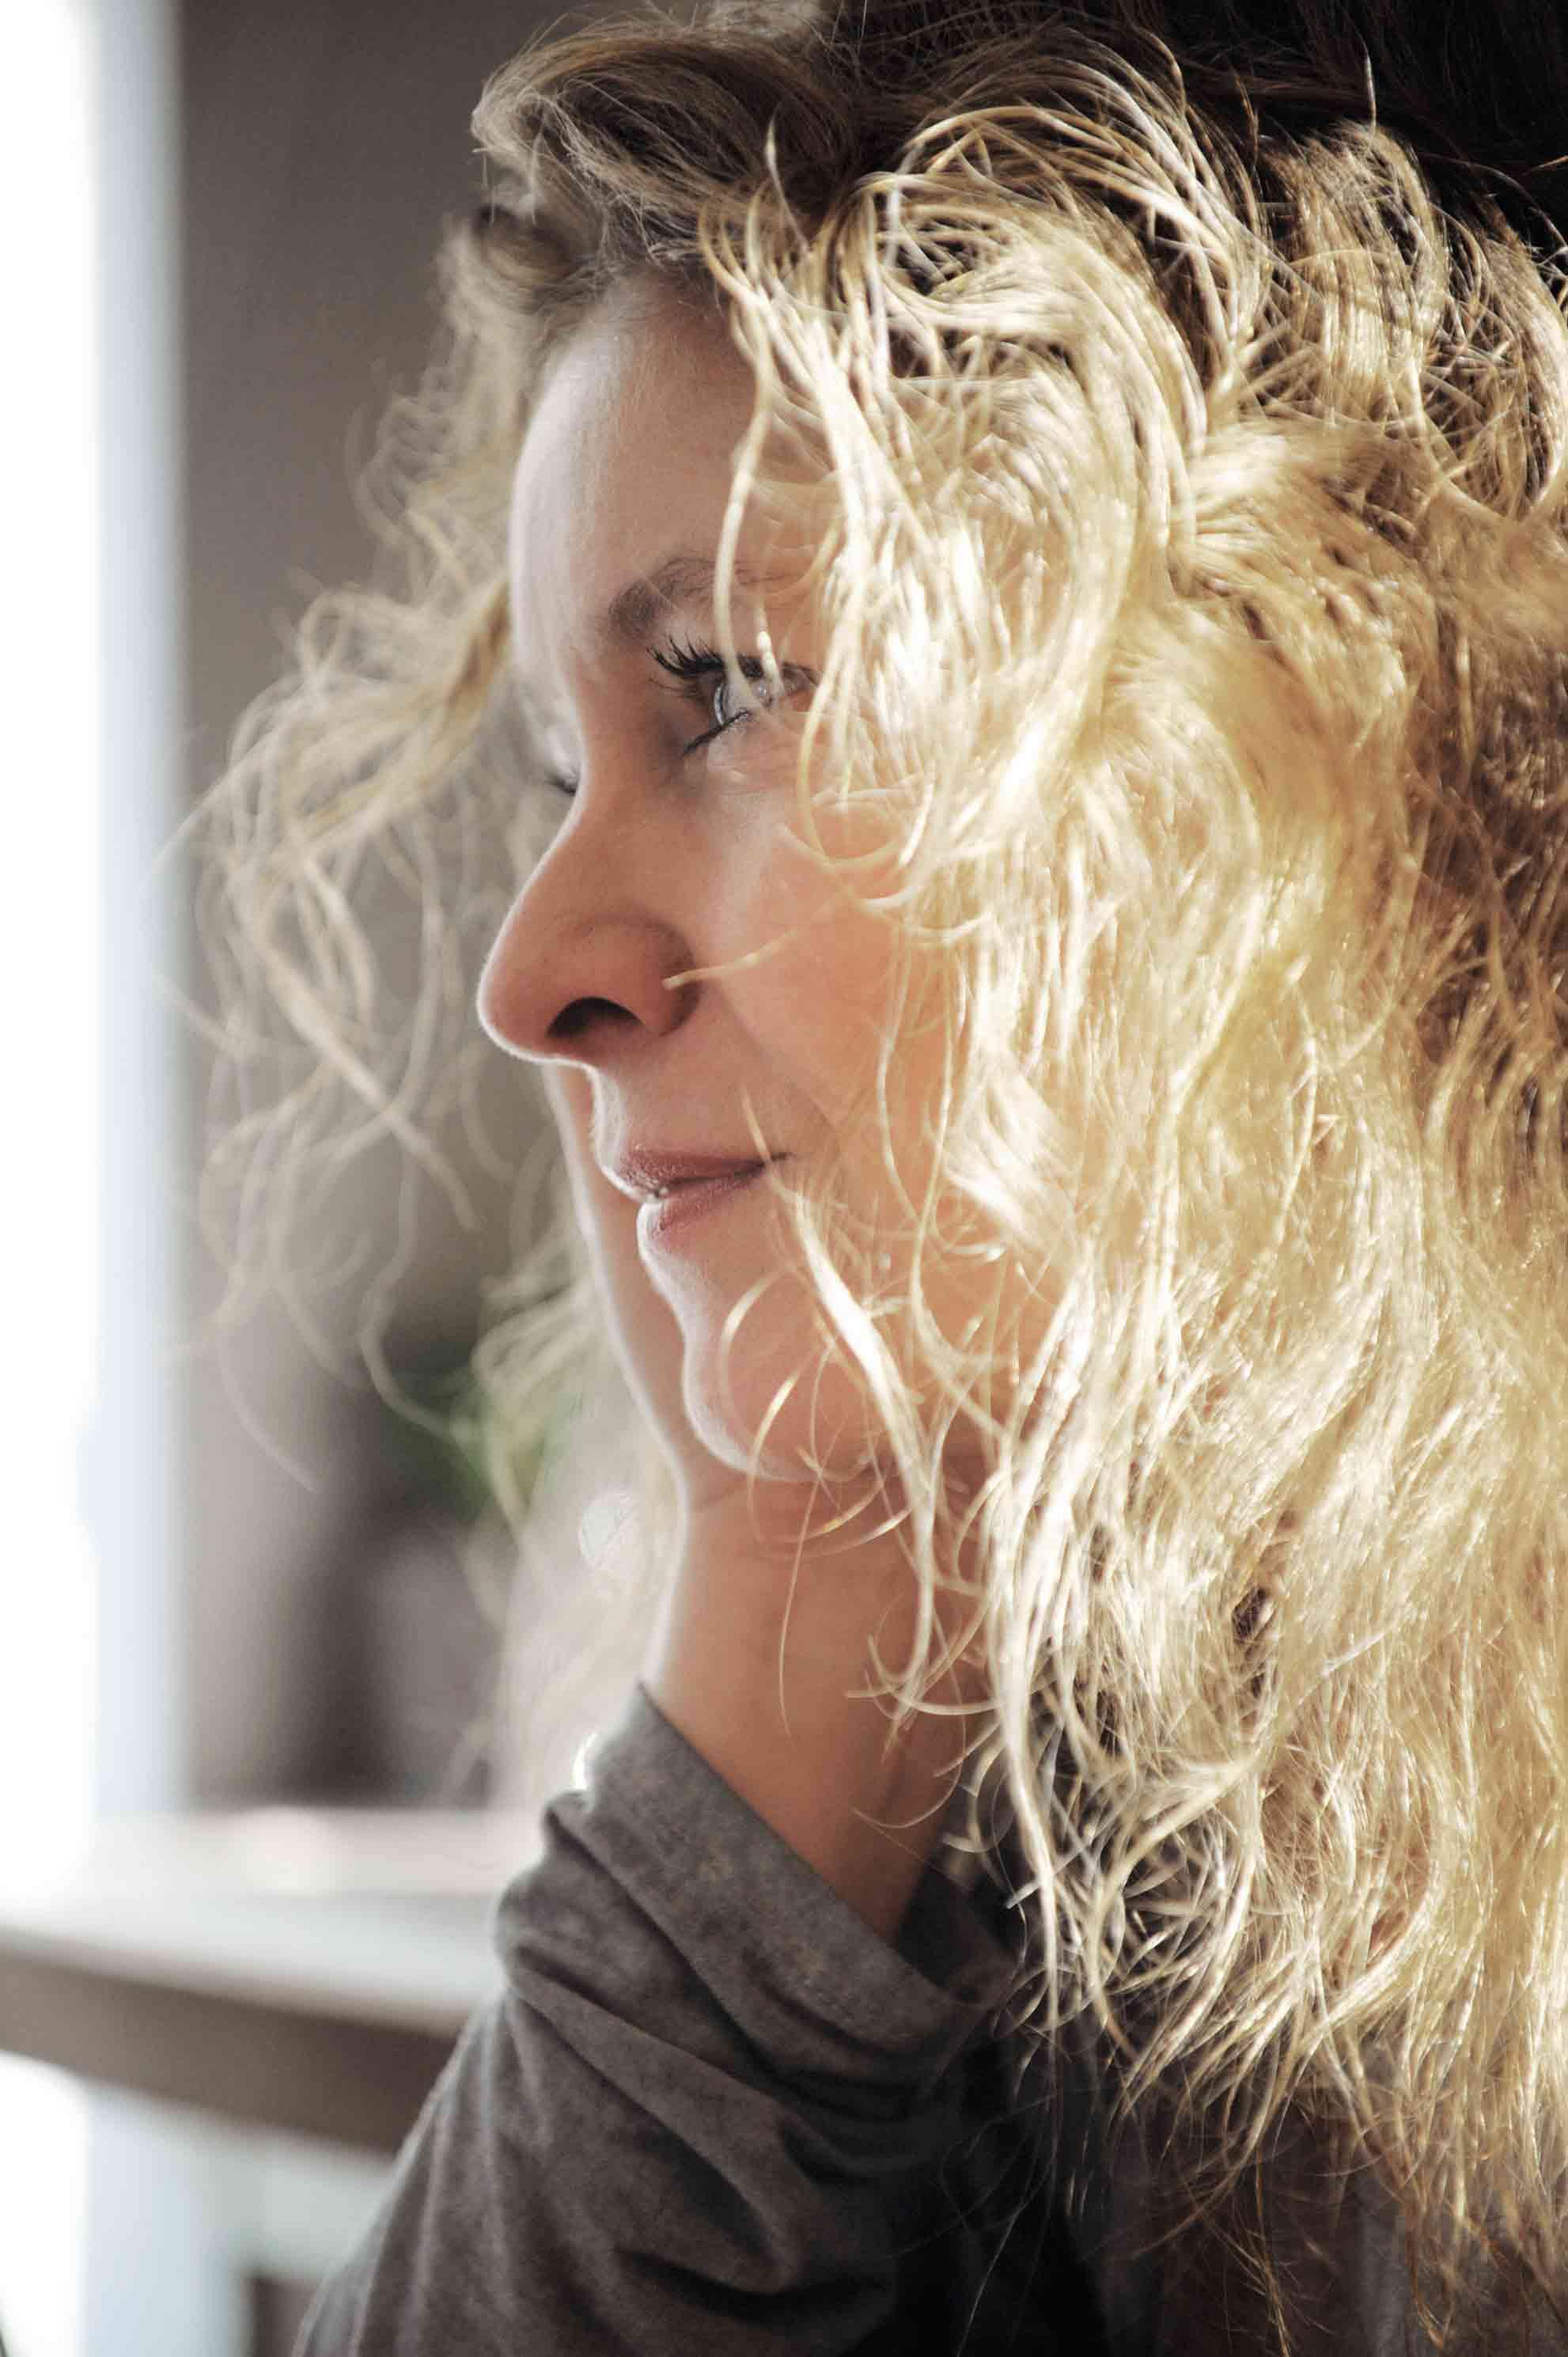 Katja Lucker Musicboard Fete de la musique Podcast